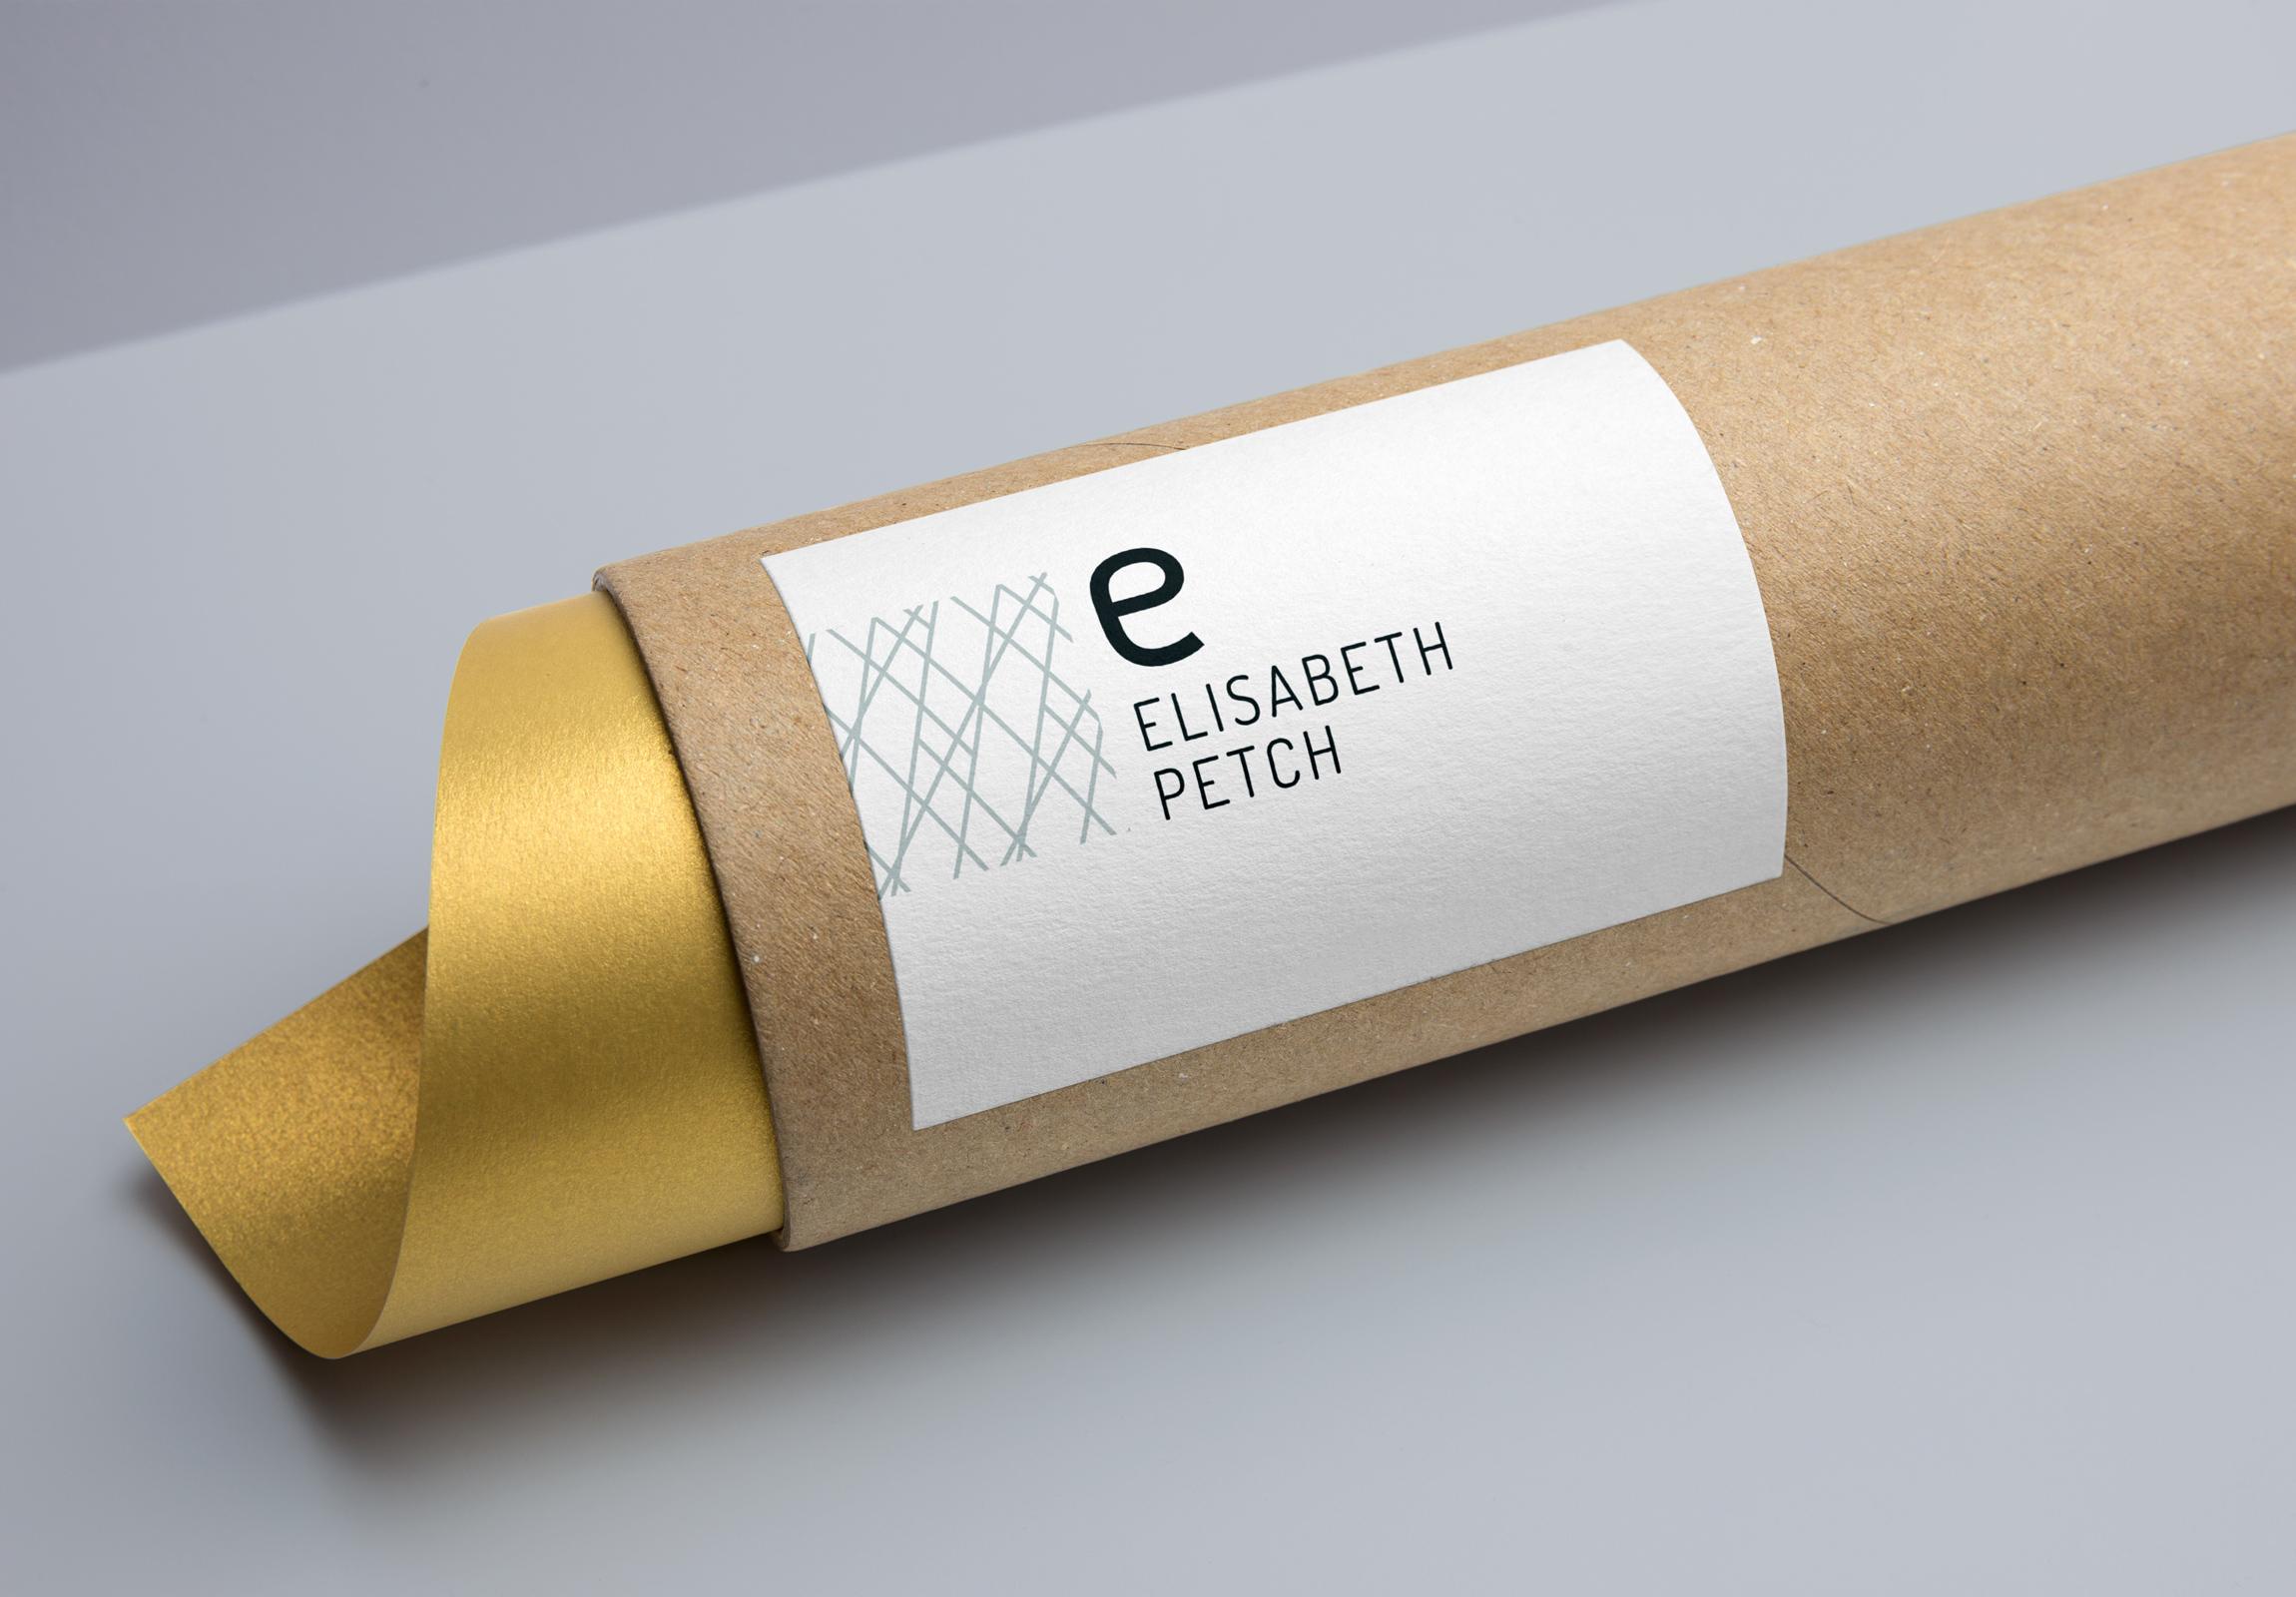 Elisabeth Petch